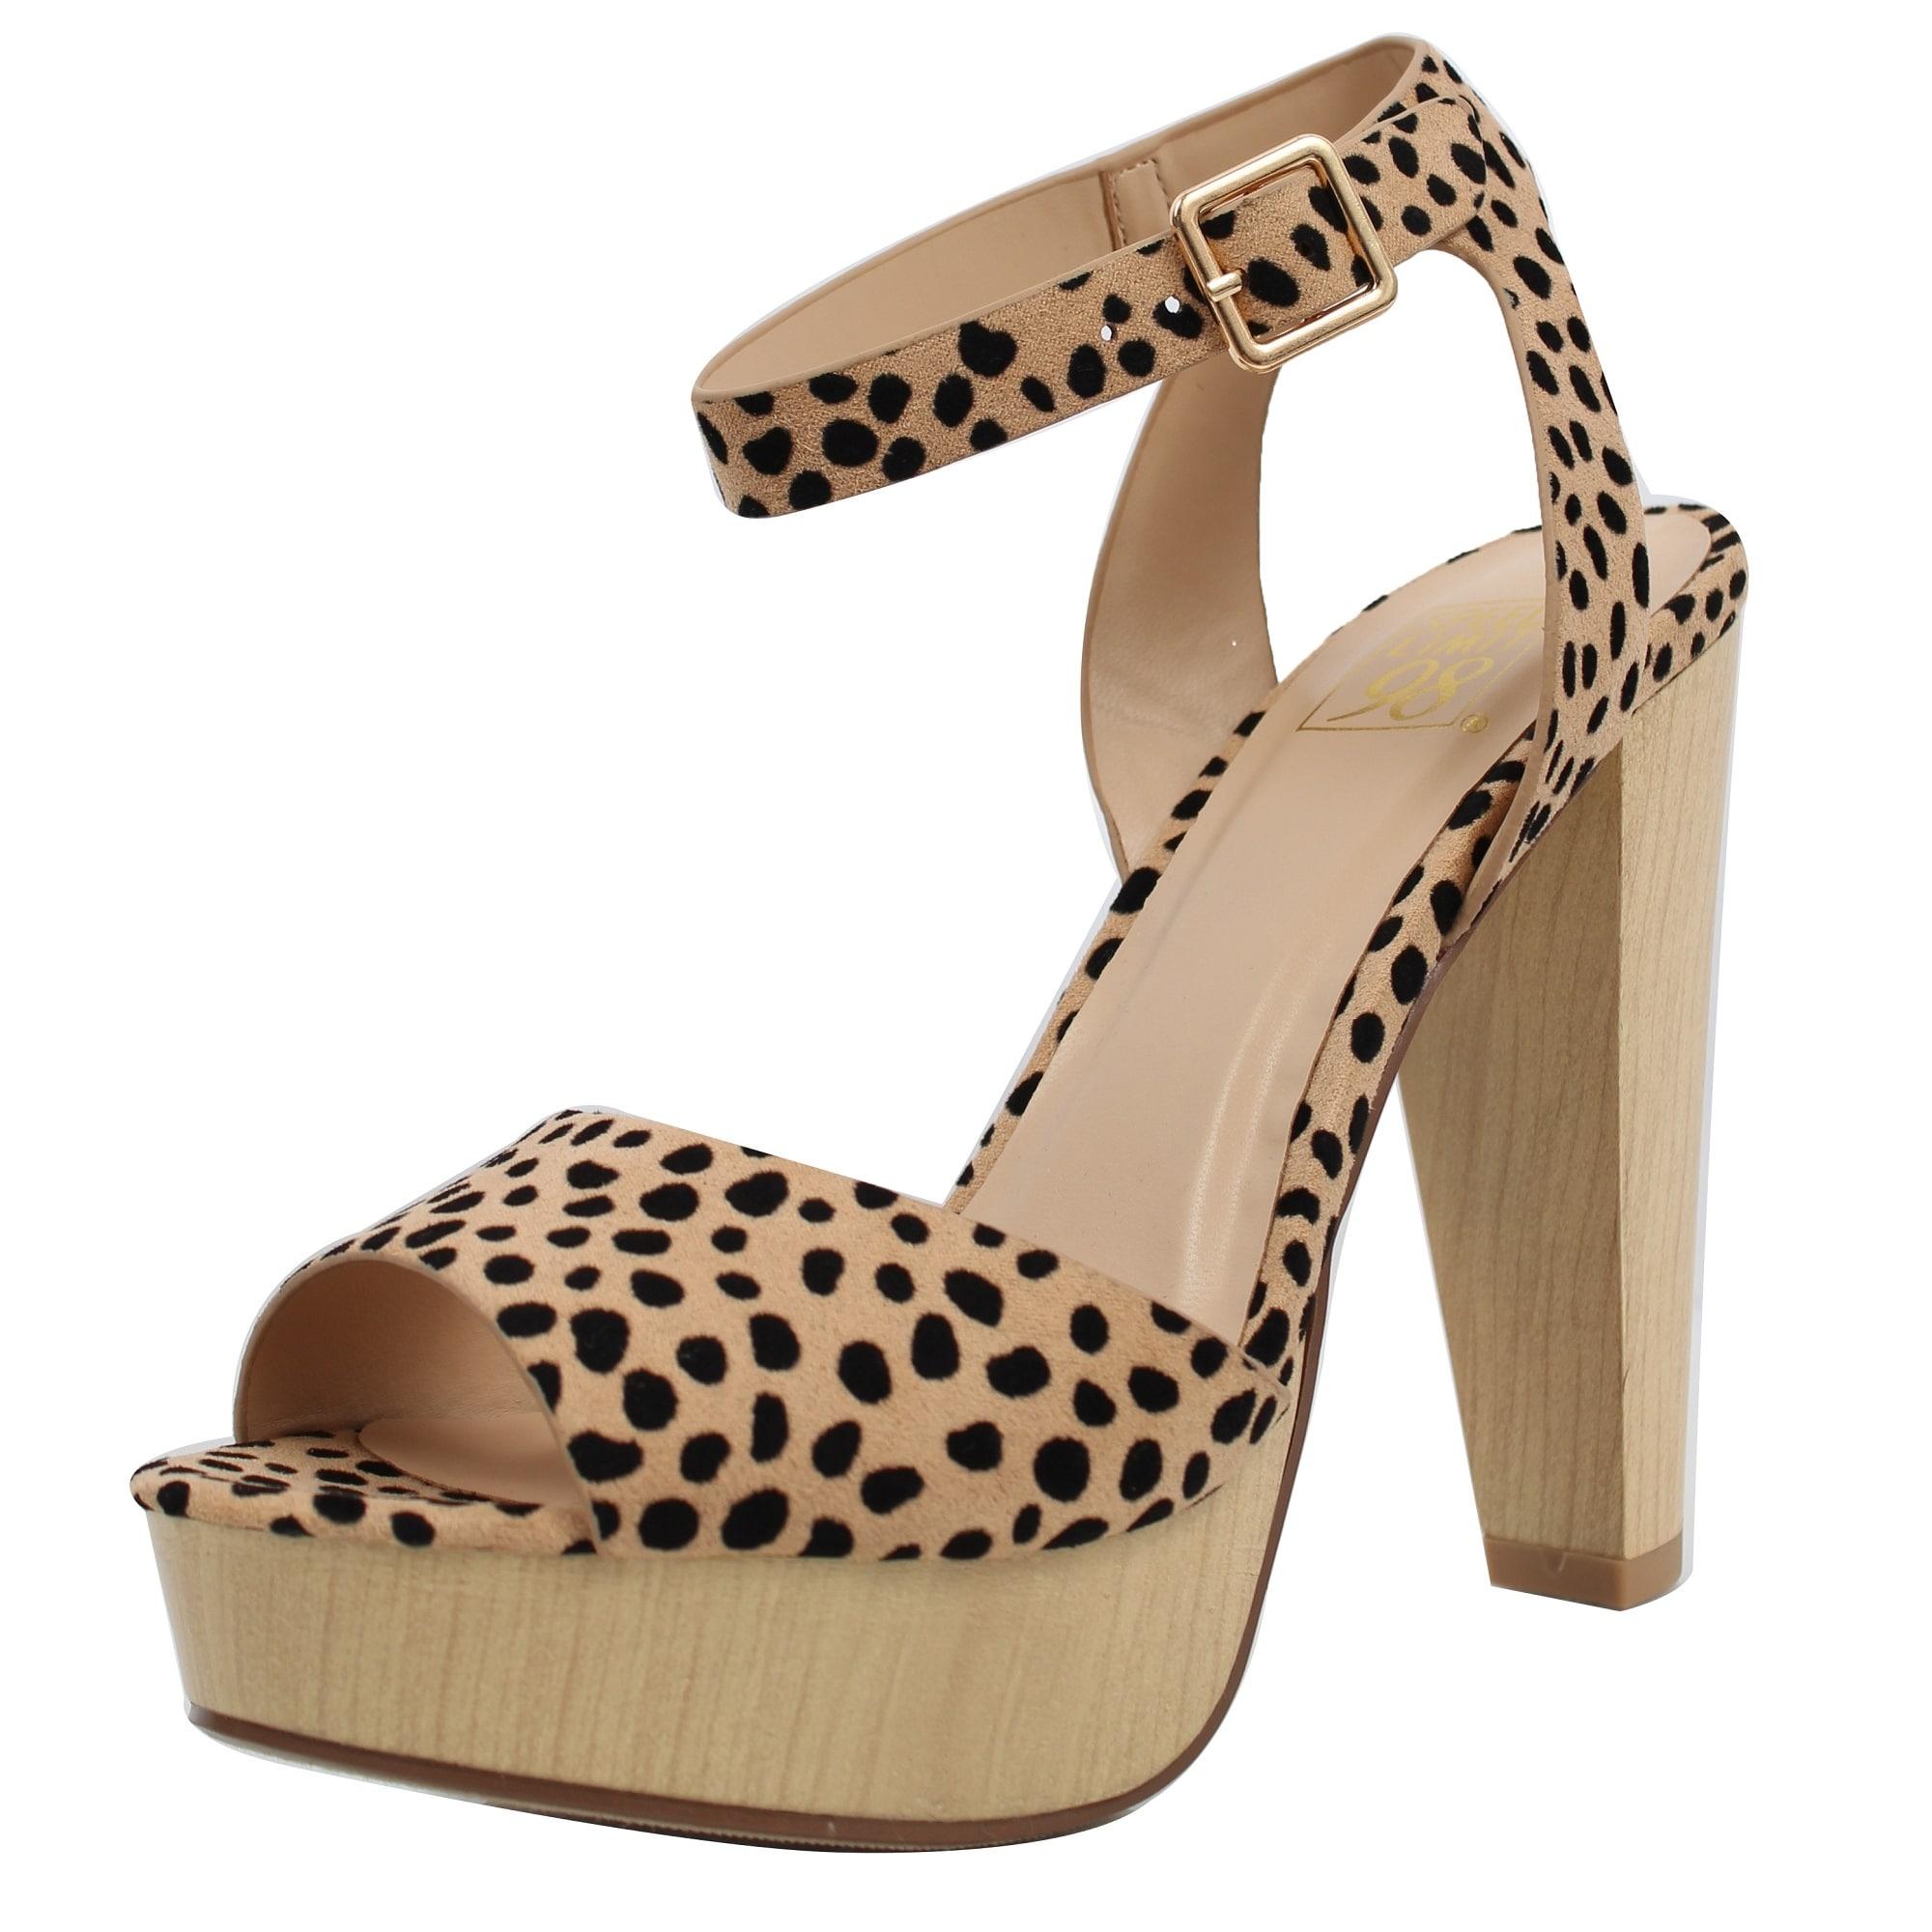 speed limit 98 black heels